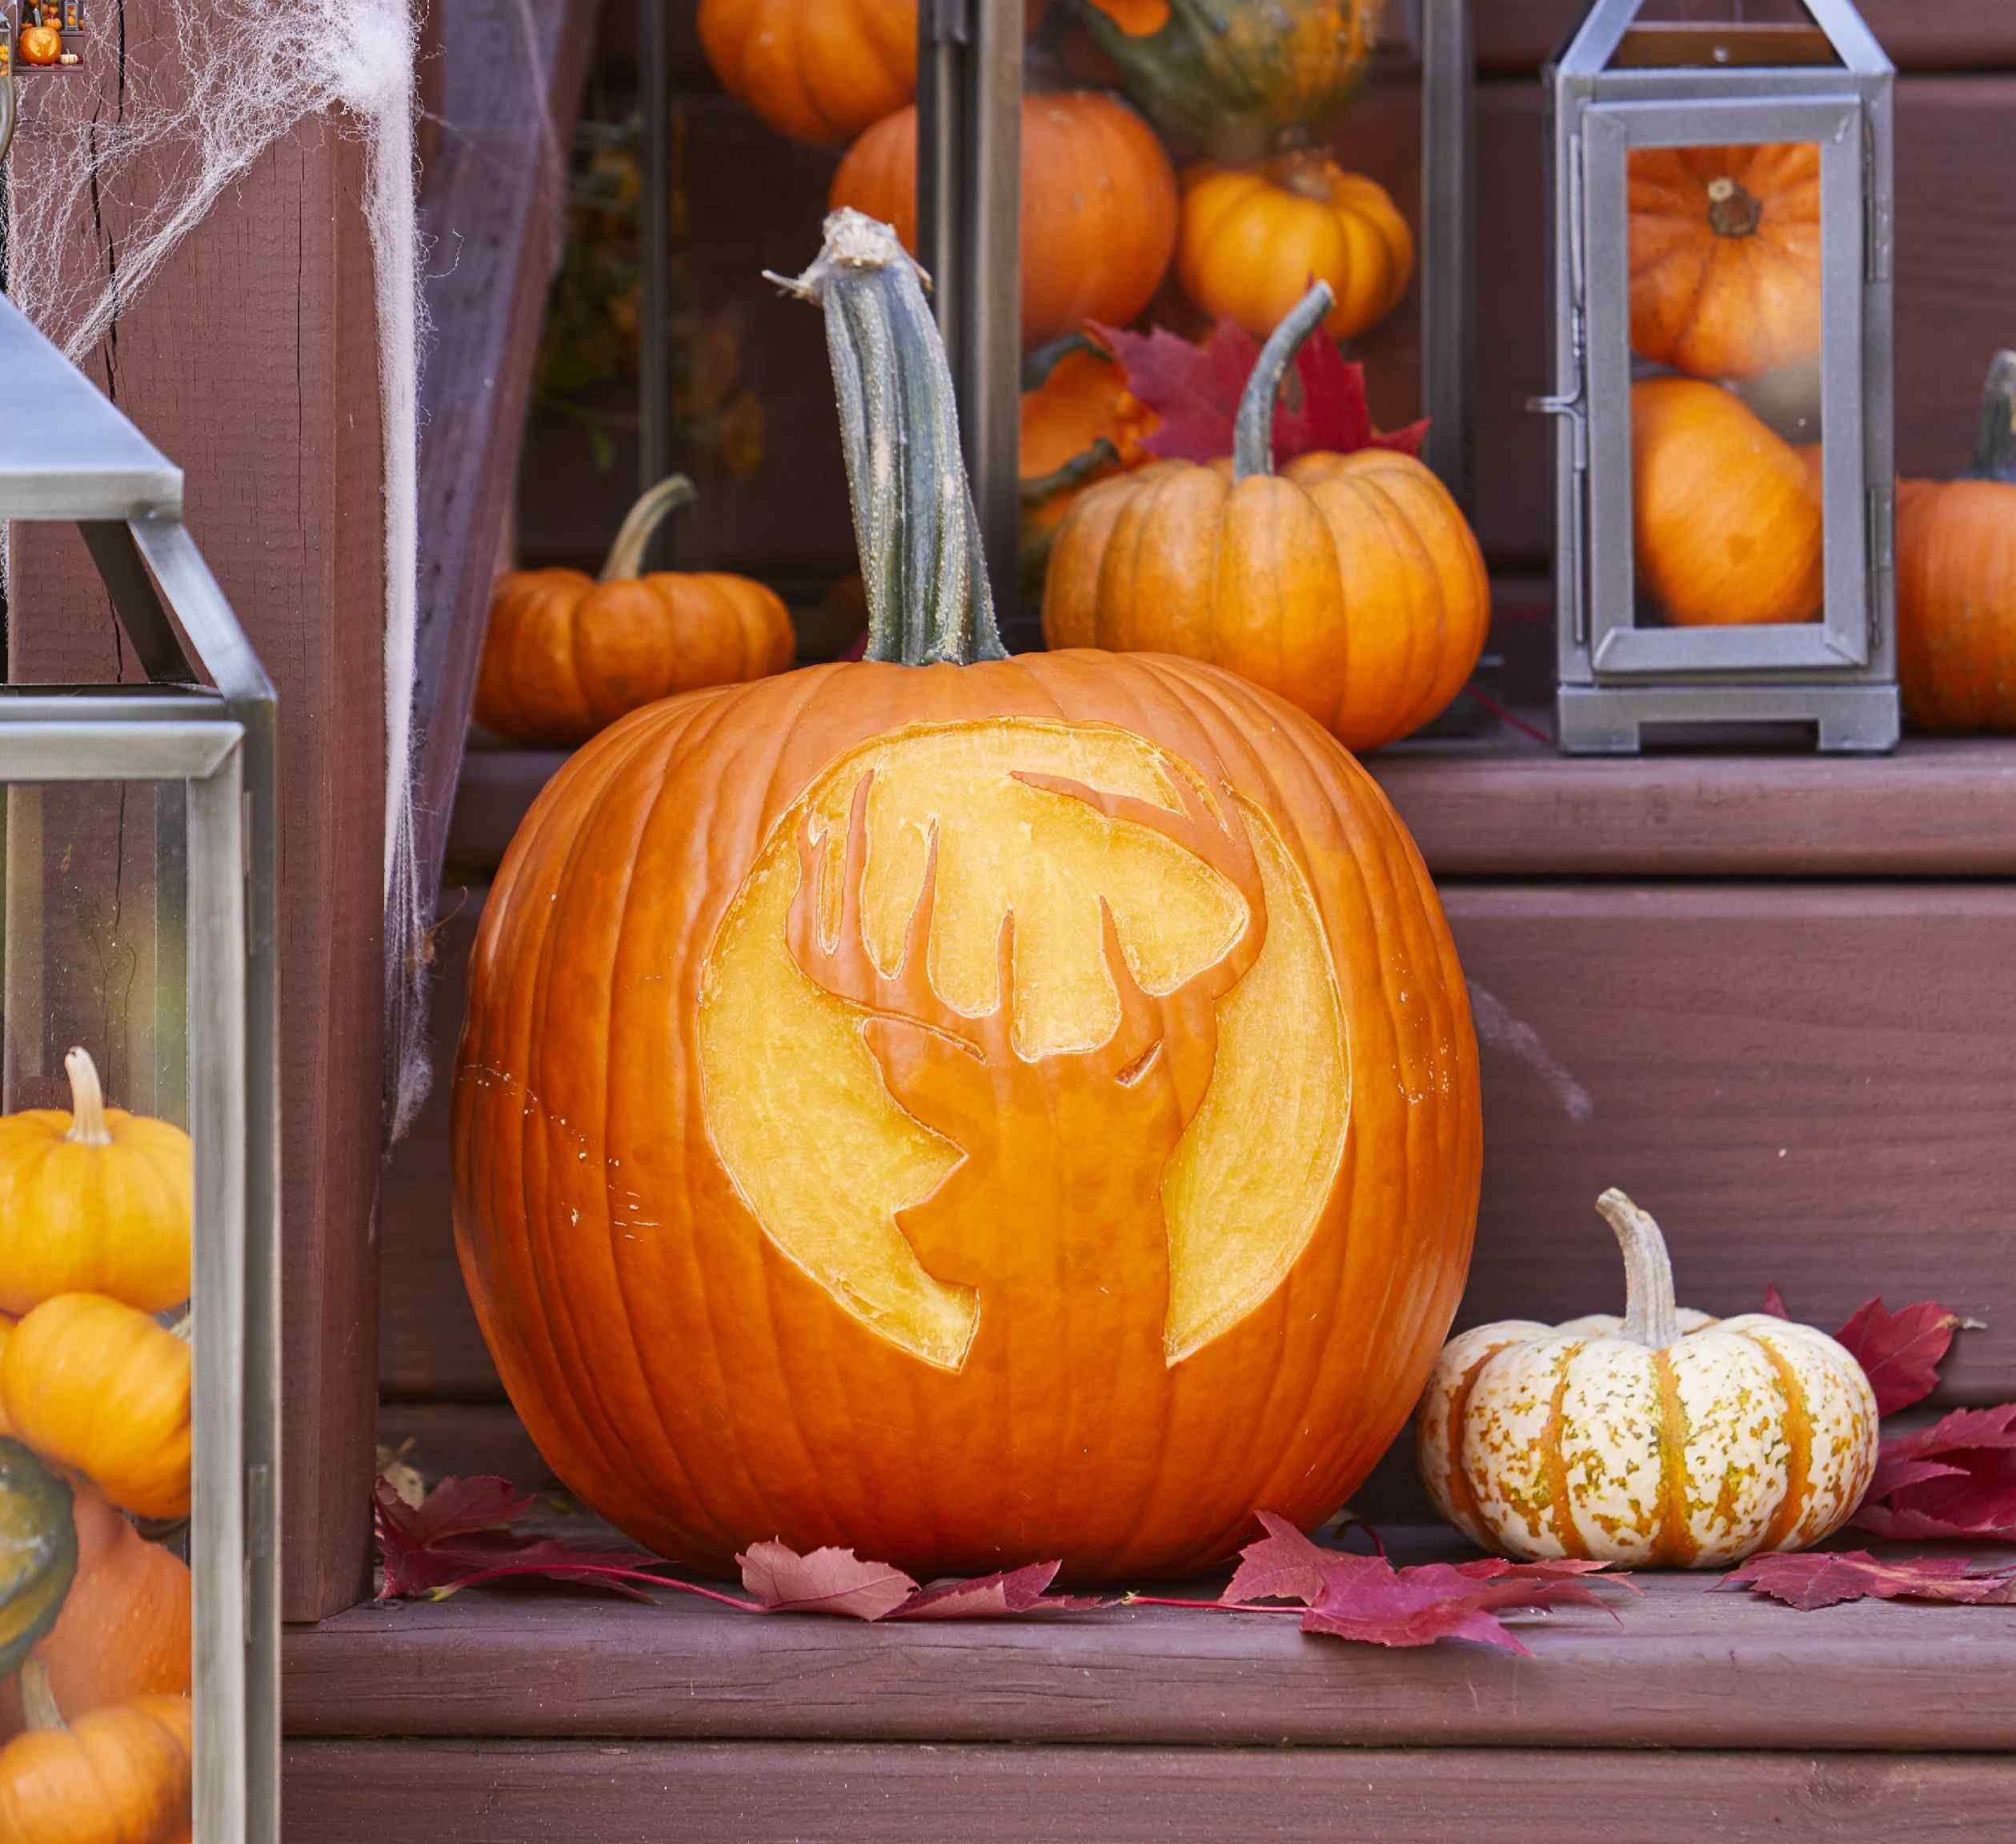 Carve an Easy Deer Silhouette Pumpkin This Halloween